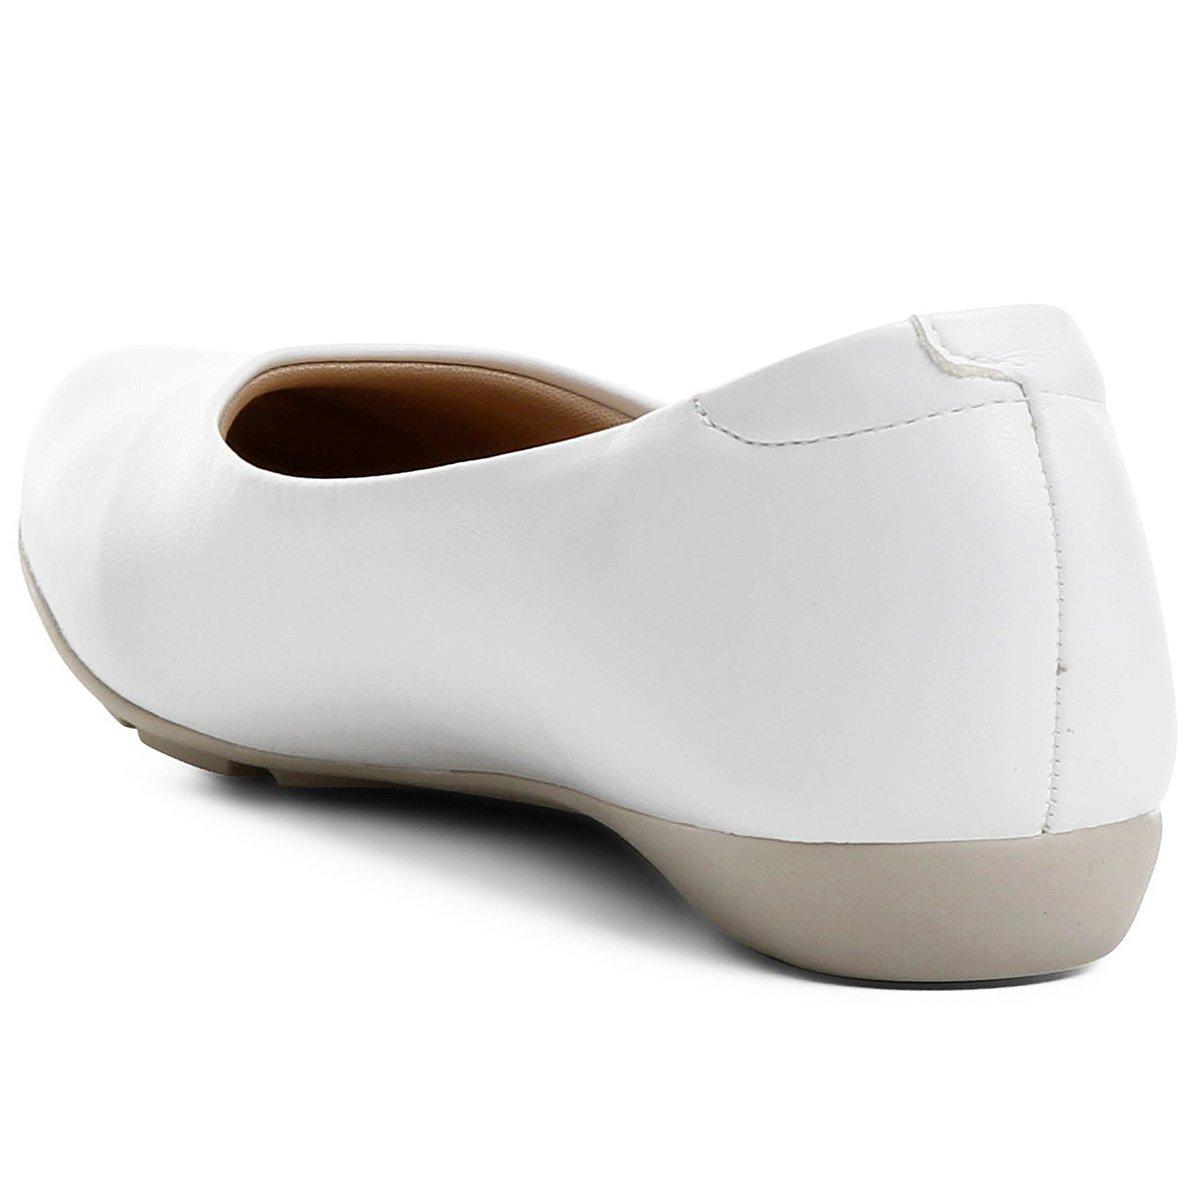 Básica Sapatilha Modare Modare Sapatilha Sapatilha Branco Branco Básica Pn8YfwqRWx